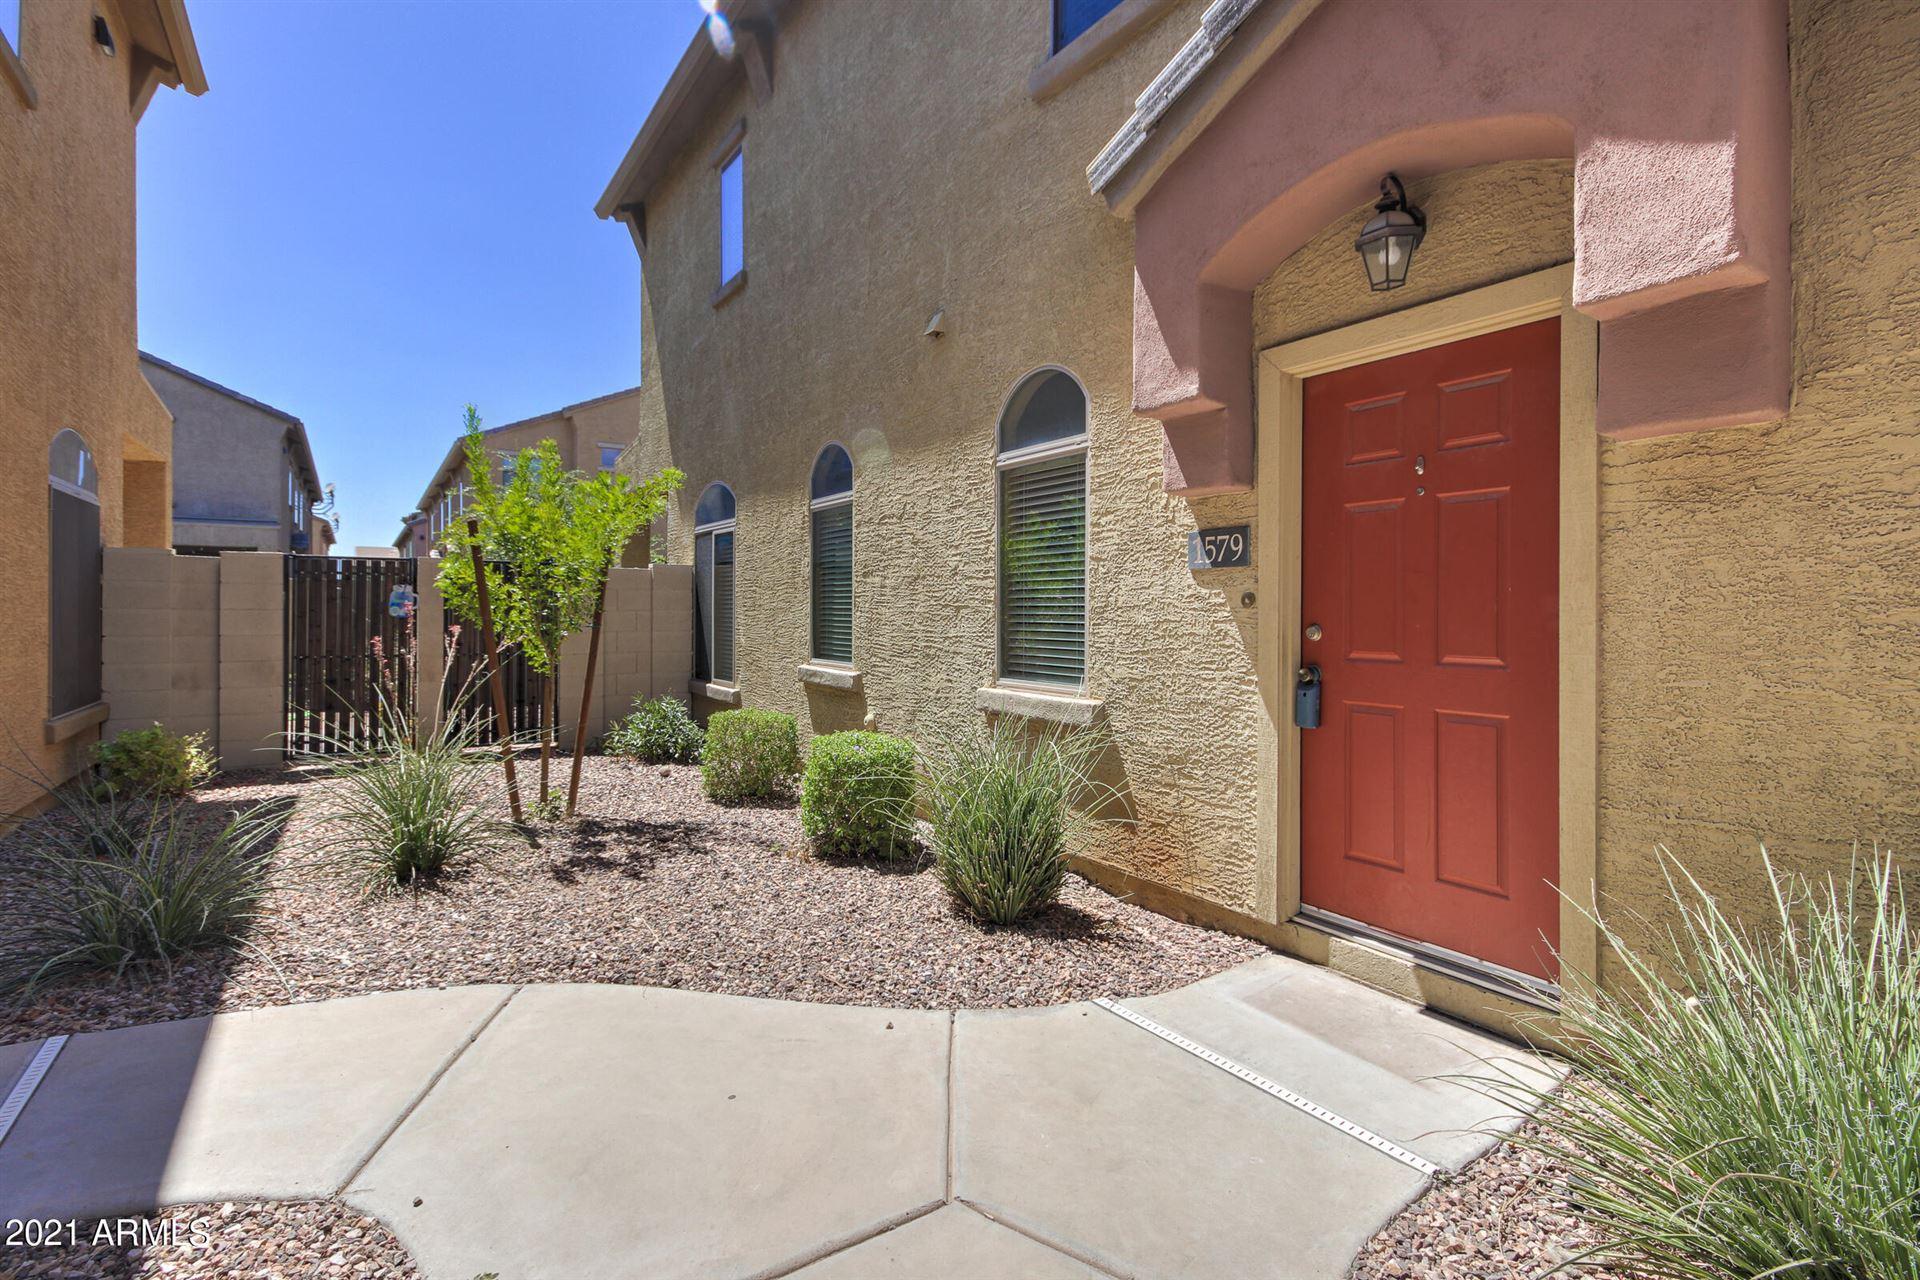 2402 E 5TH Street #1579, Tempe, AZ 85281 - MLS#: 6250603